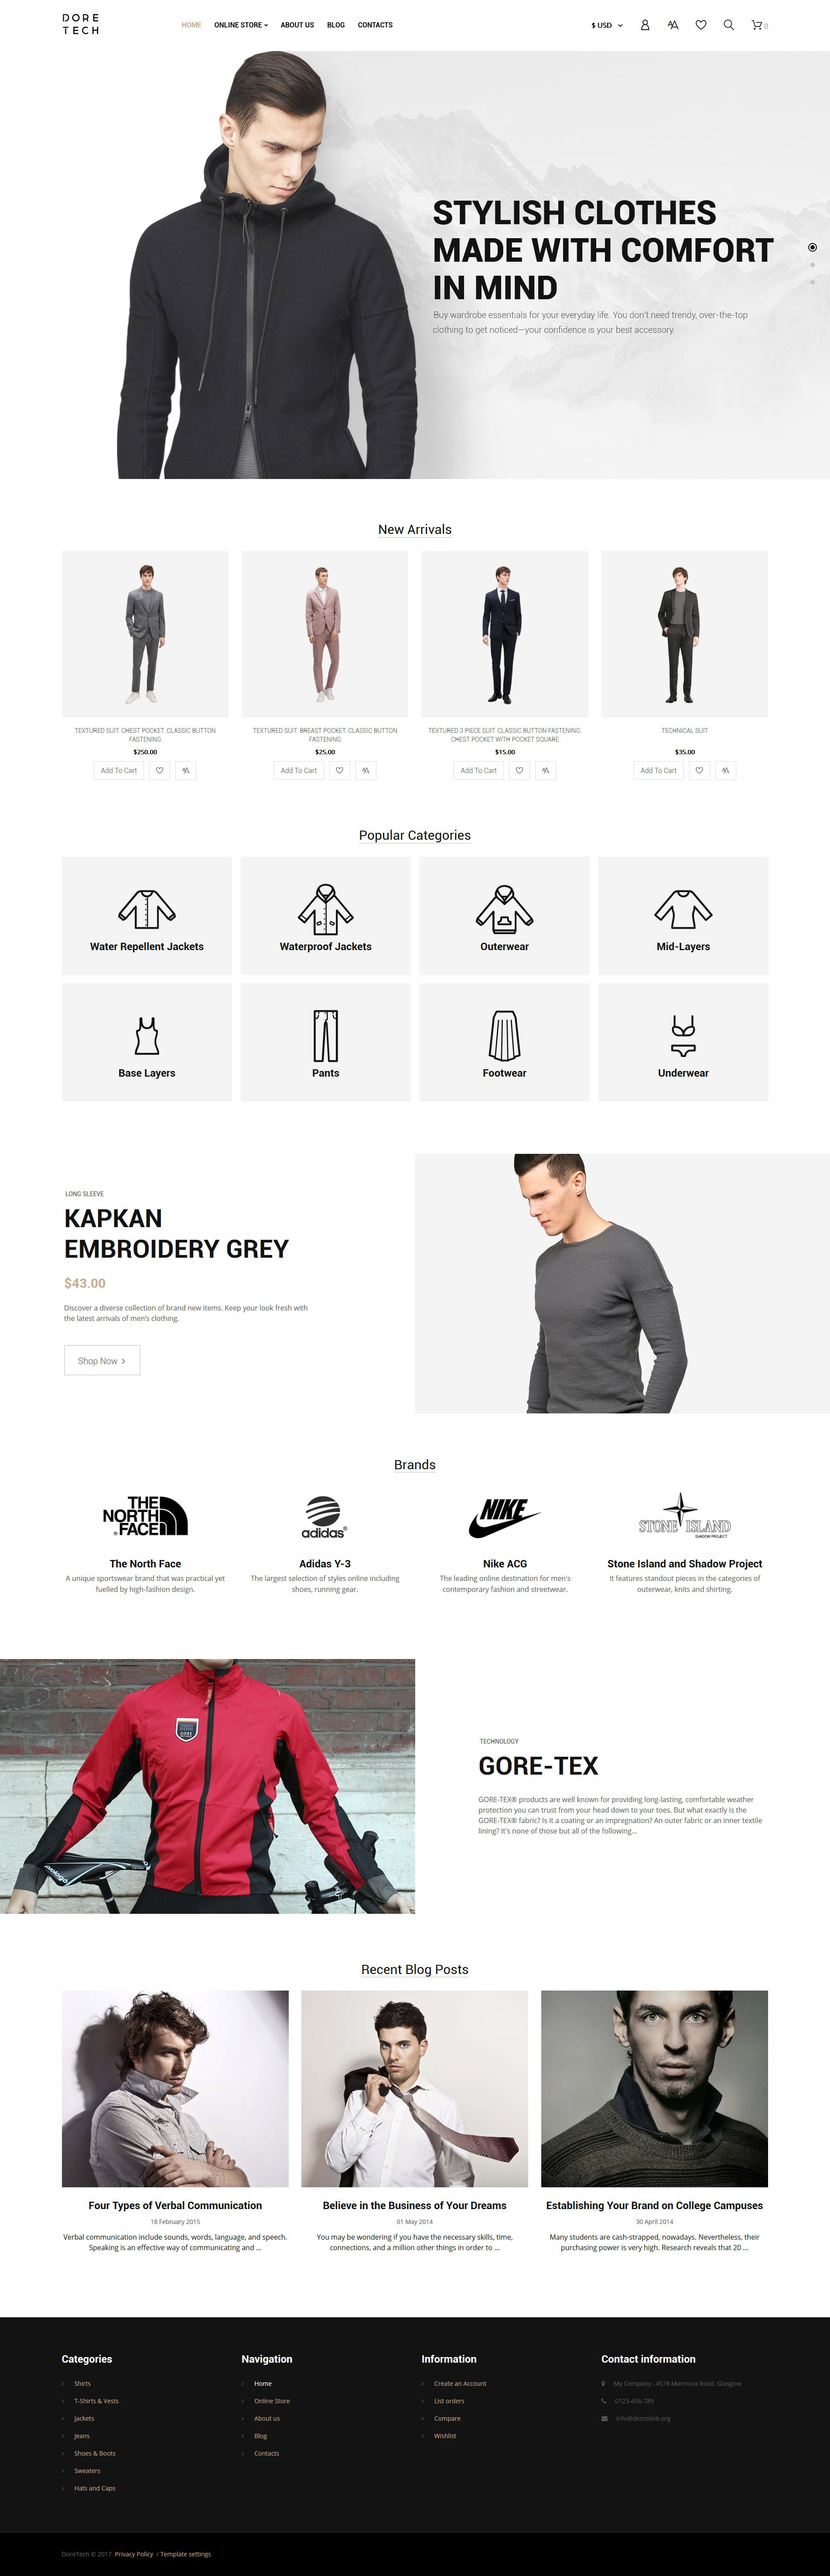 VirtueMart шаблон на тему мода та краса №63887 - скріншот